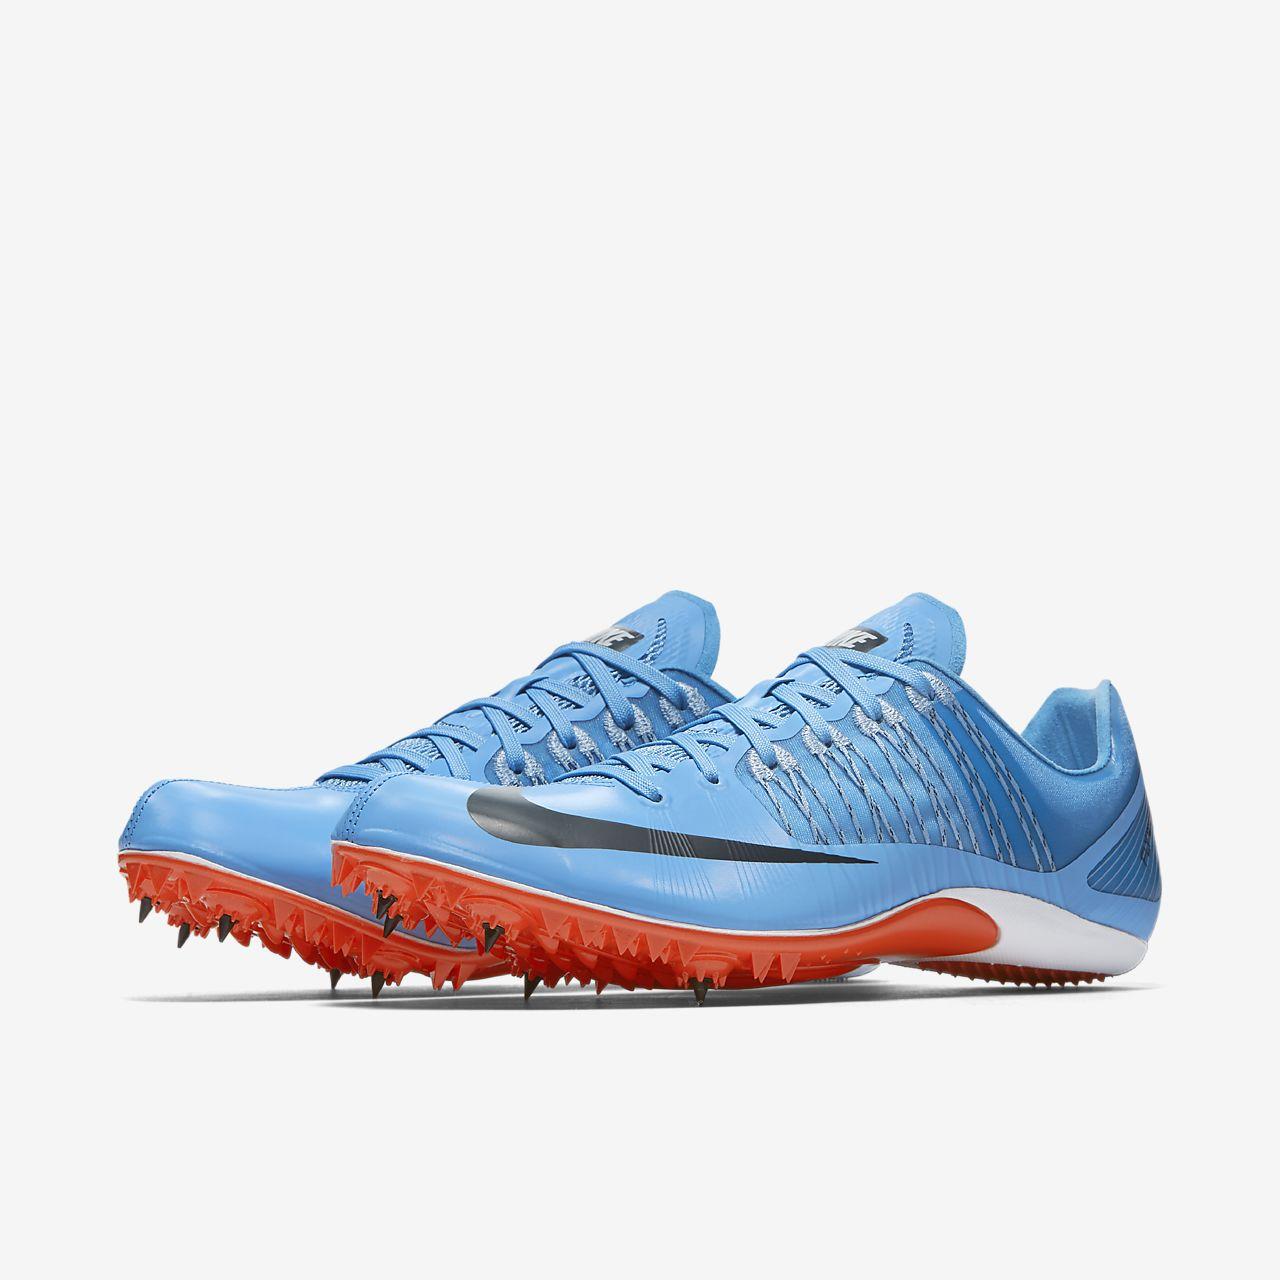 ... Nike Zoom Celar 5 Unisex Sprint Spike